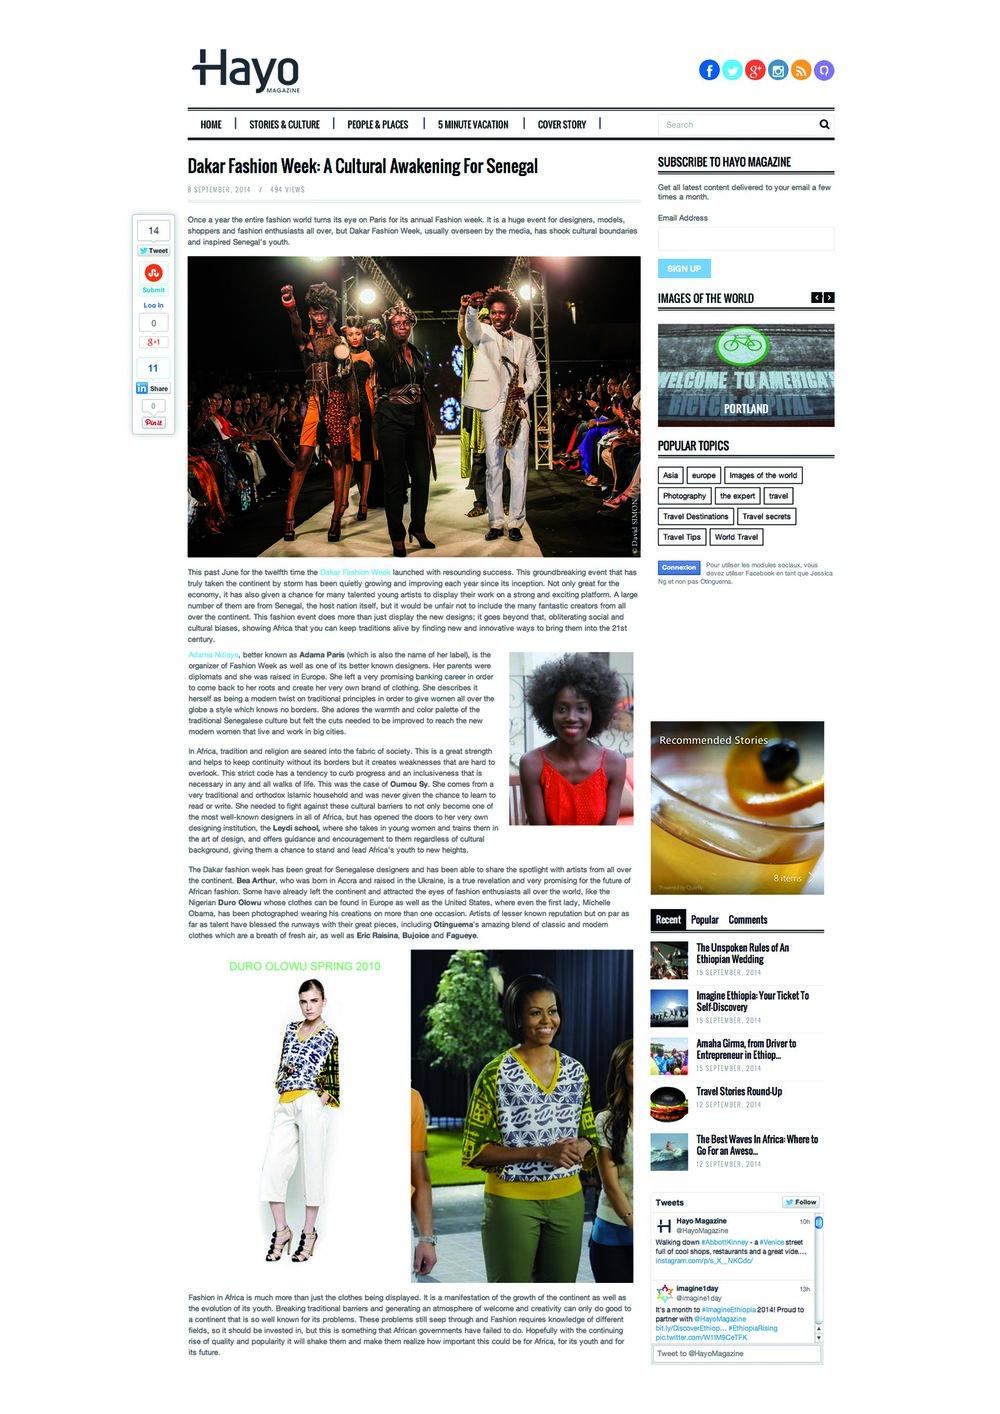 Hayo Webzine